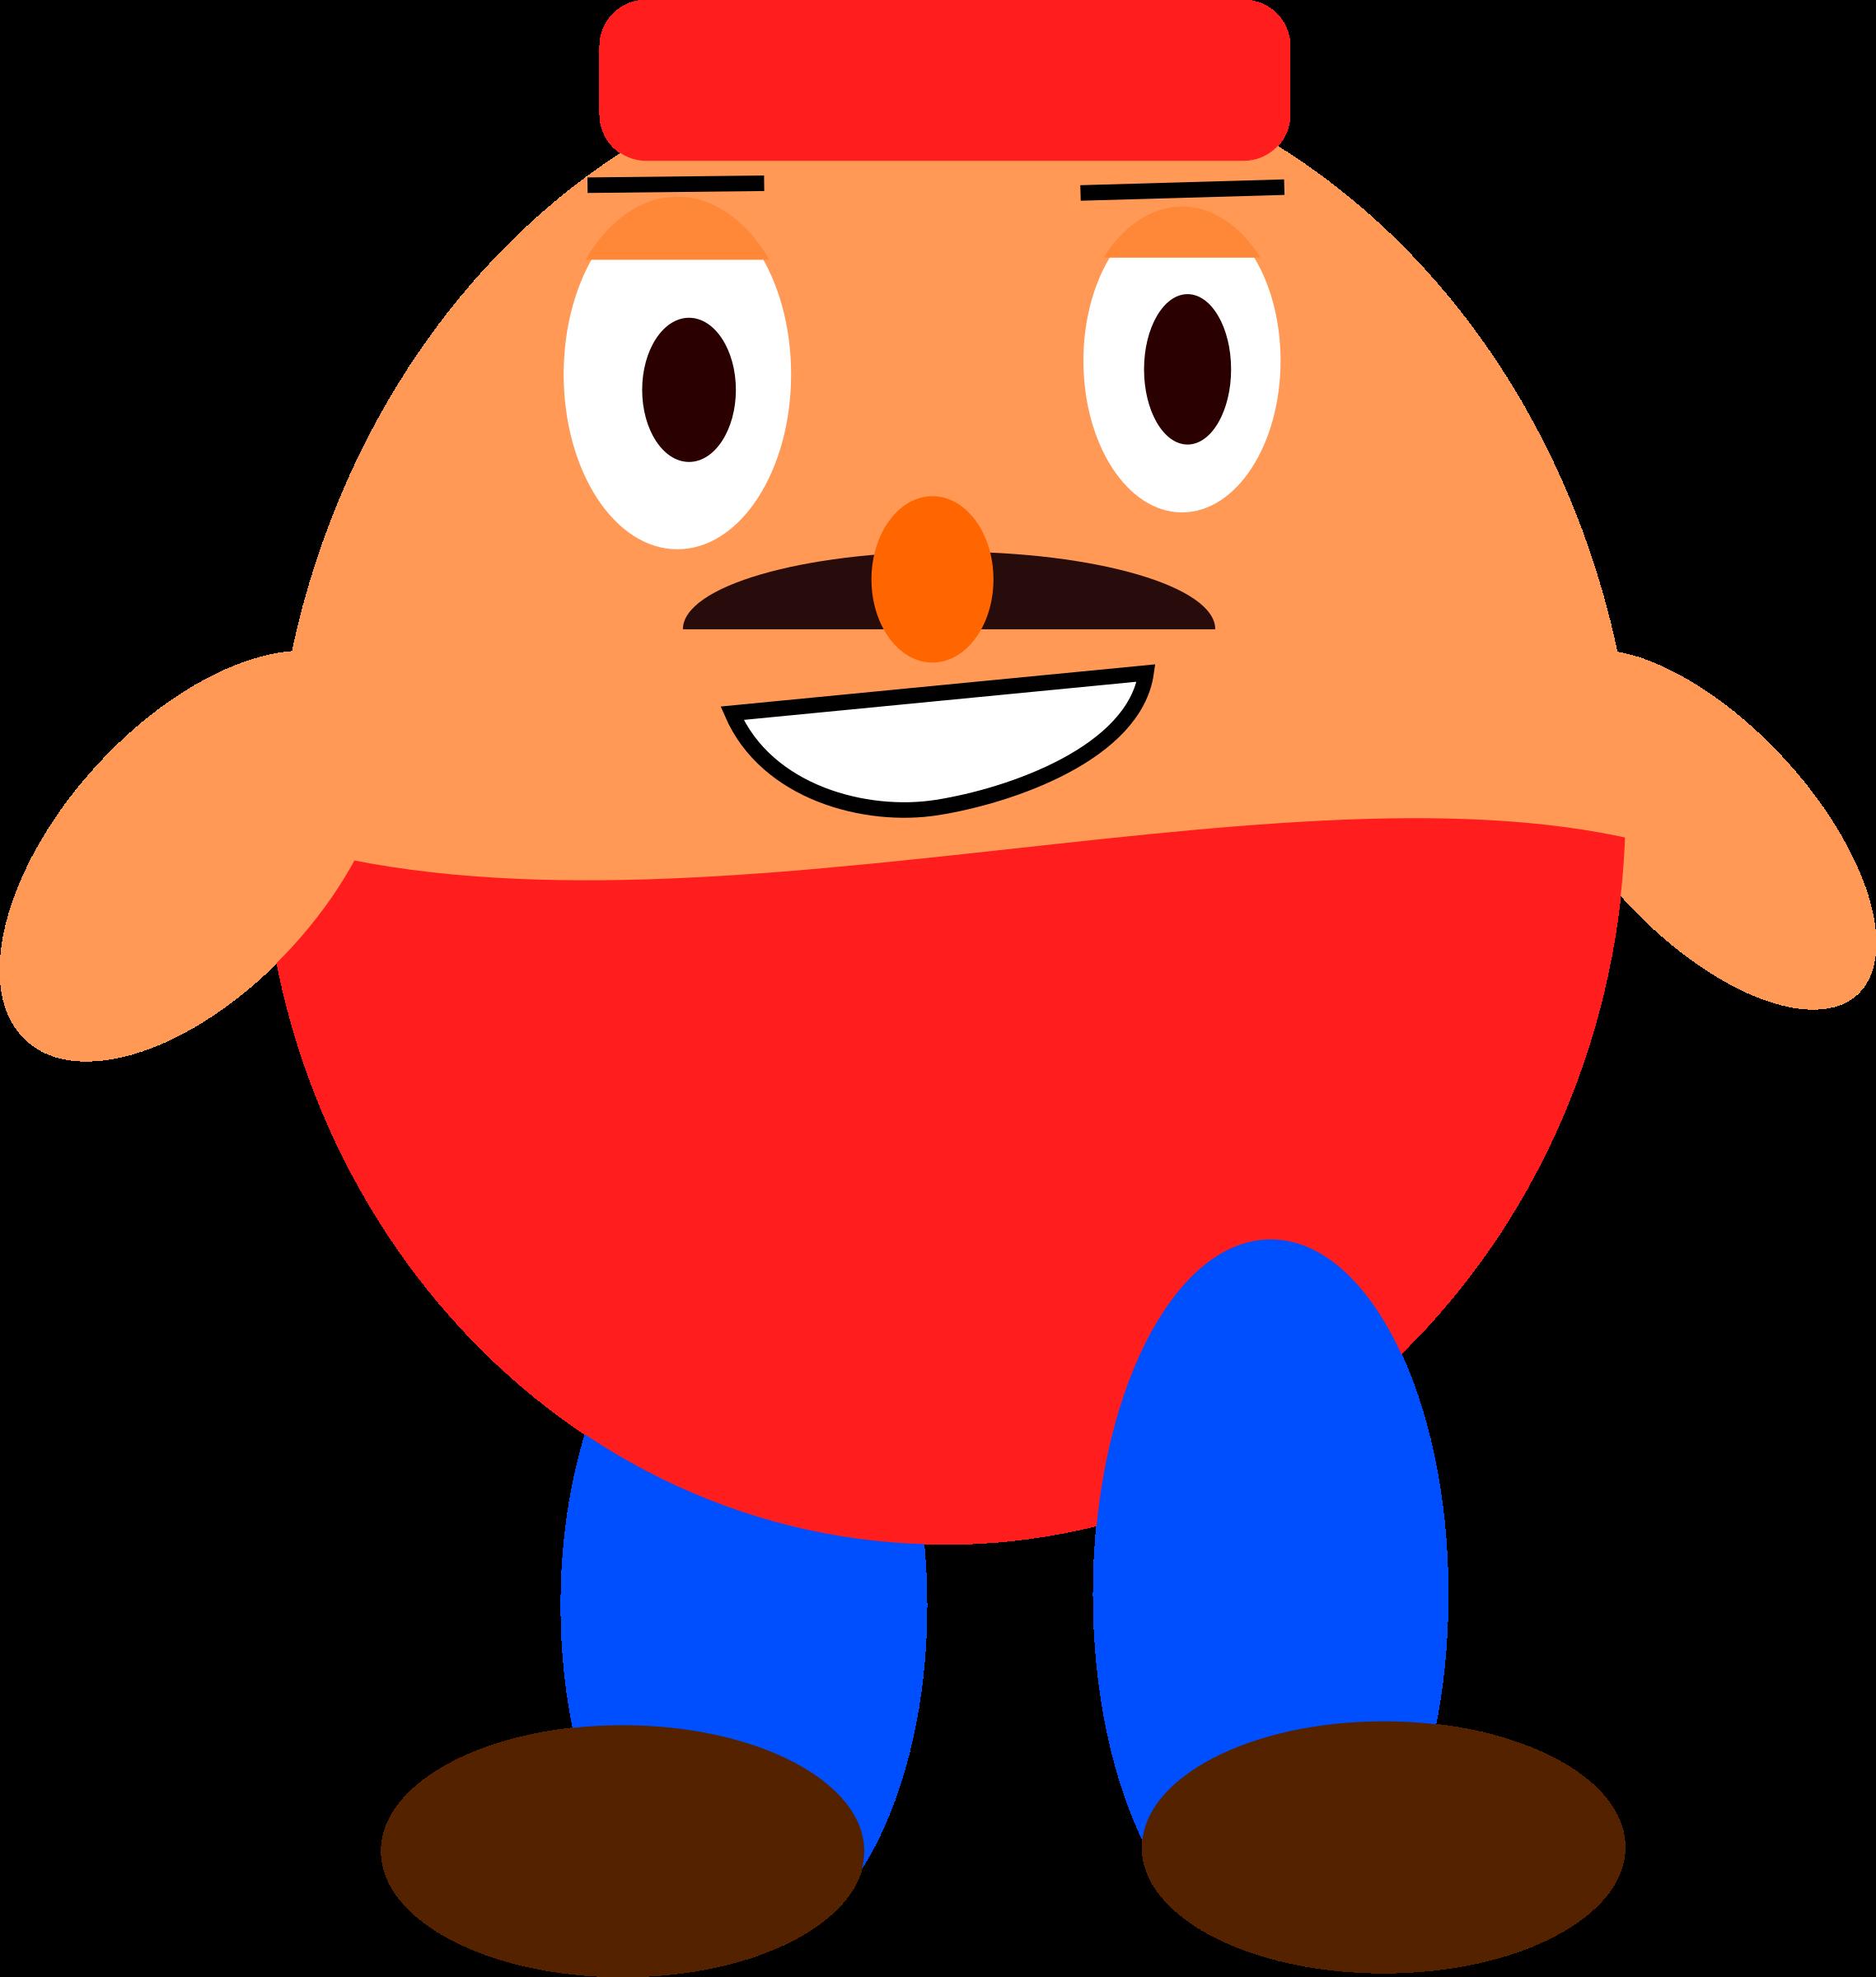 Character clipart cute. Platformer game big image